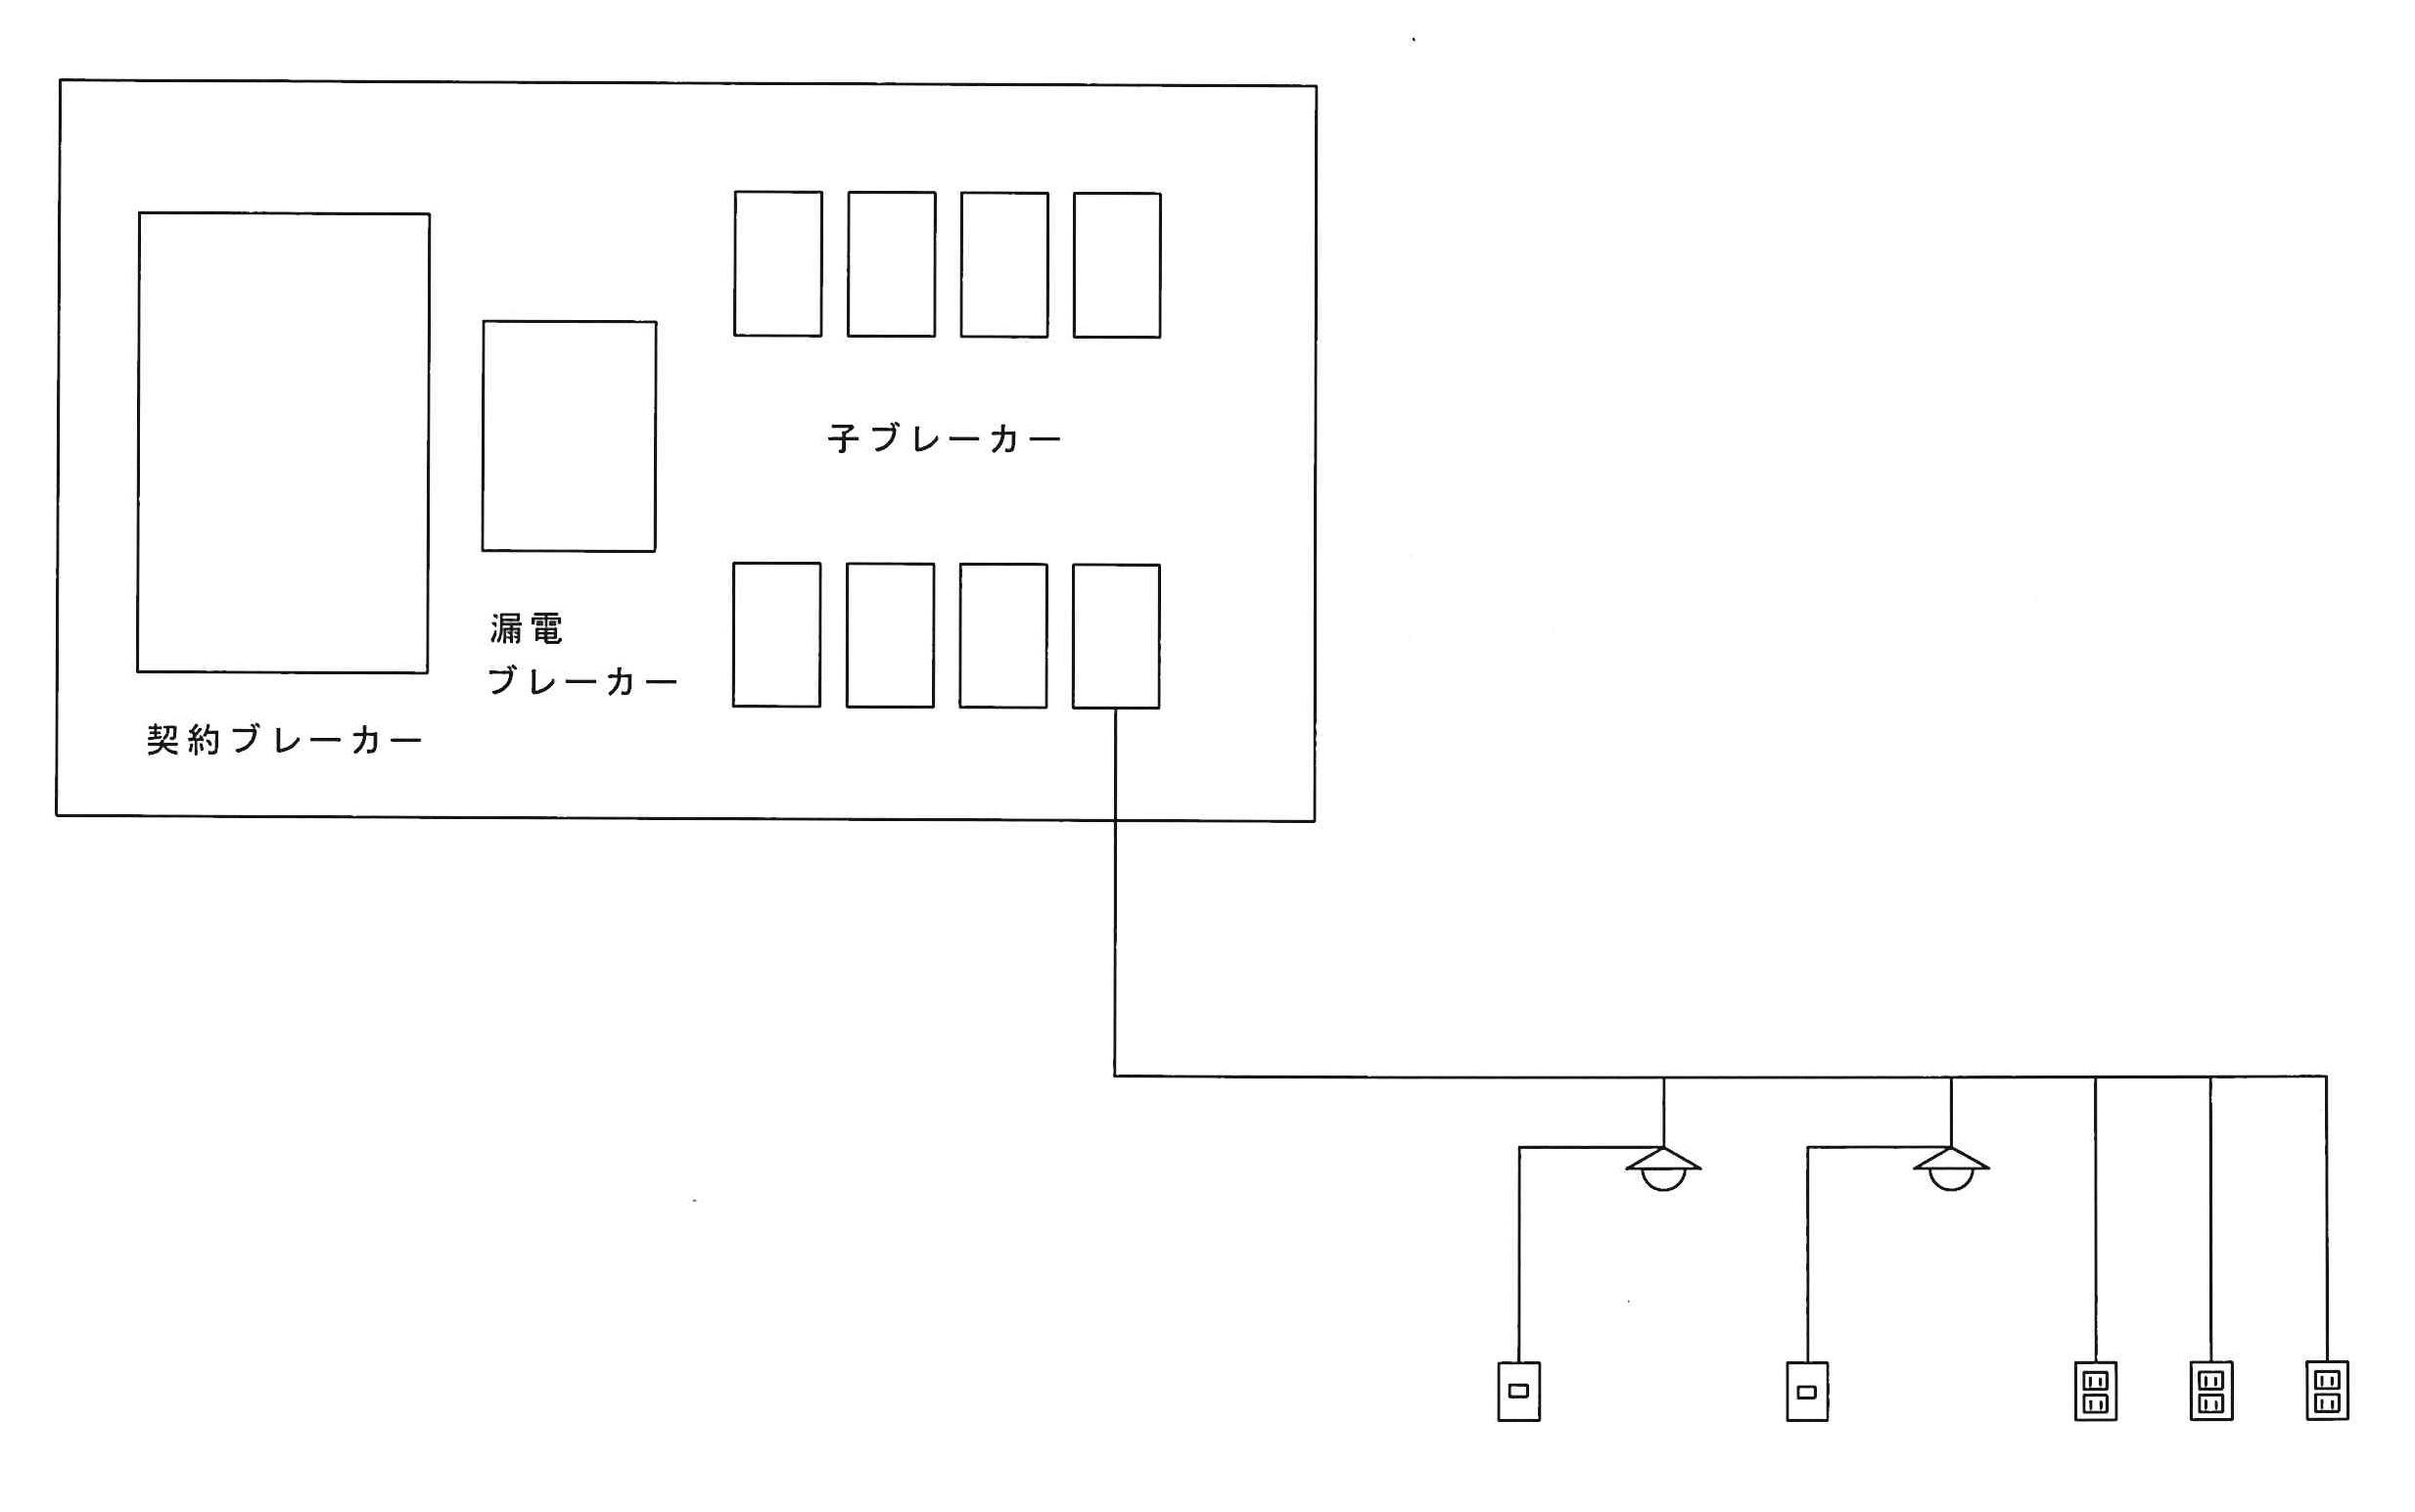 f8d0ac5c3147d 例えば、一つのブレーカーに台所と居間の照明器具、台所のコンセント2つに居間のコンセント3つが  繋がっていると仮定すると、その回路で使われる機器は上記の照明 ...